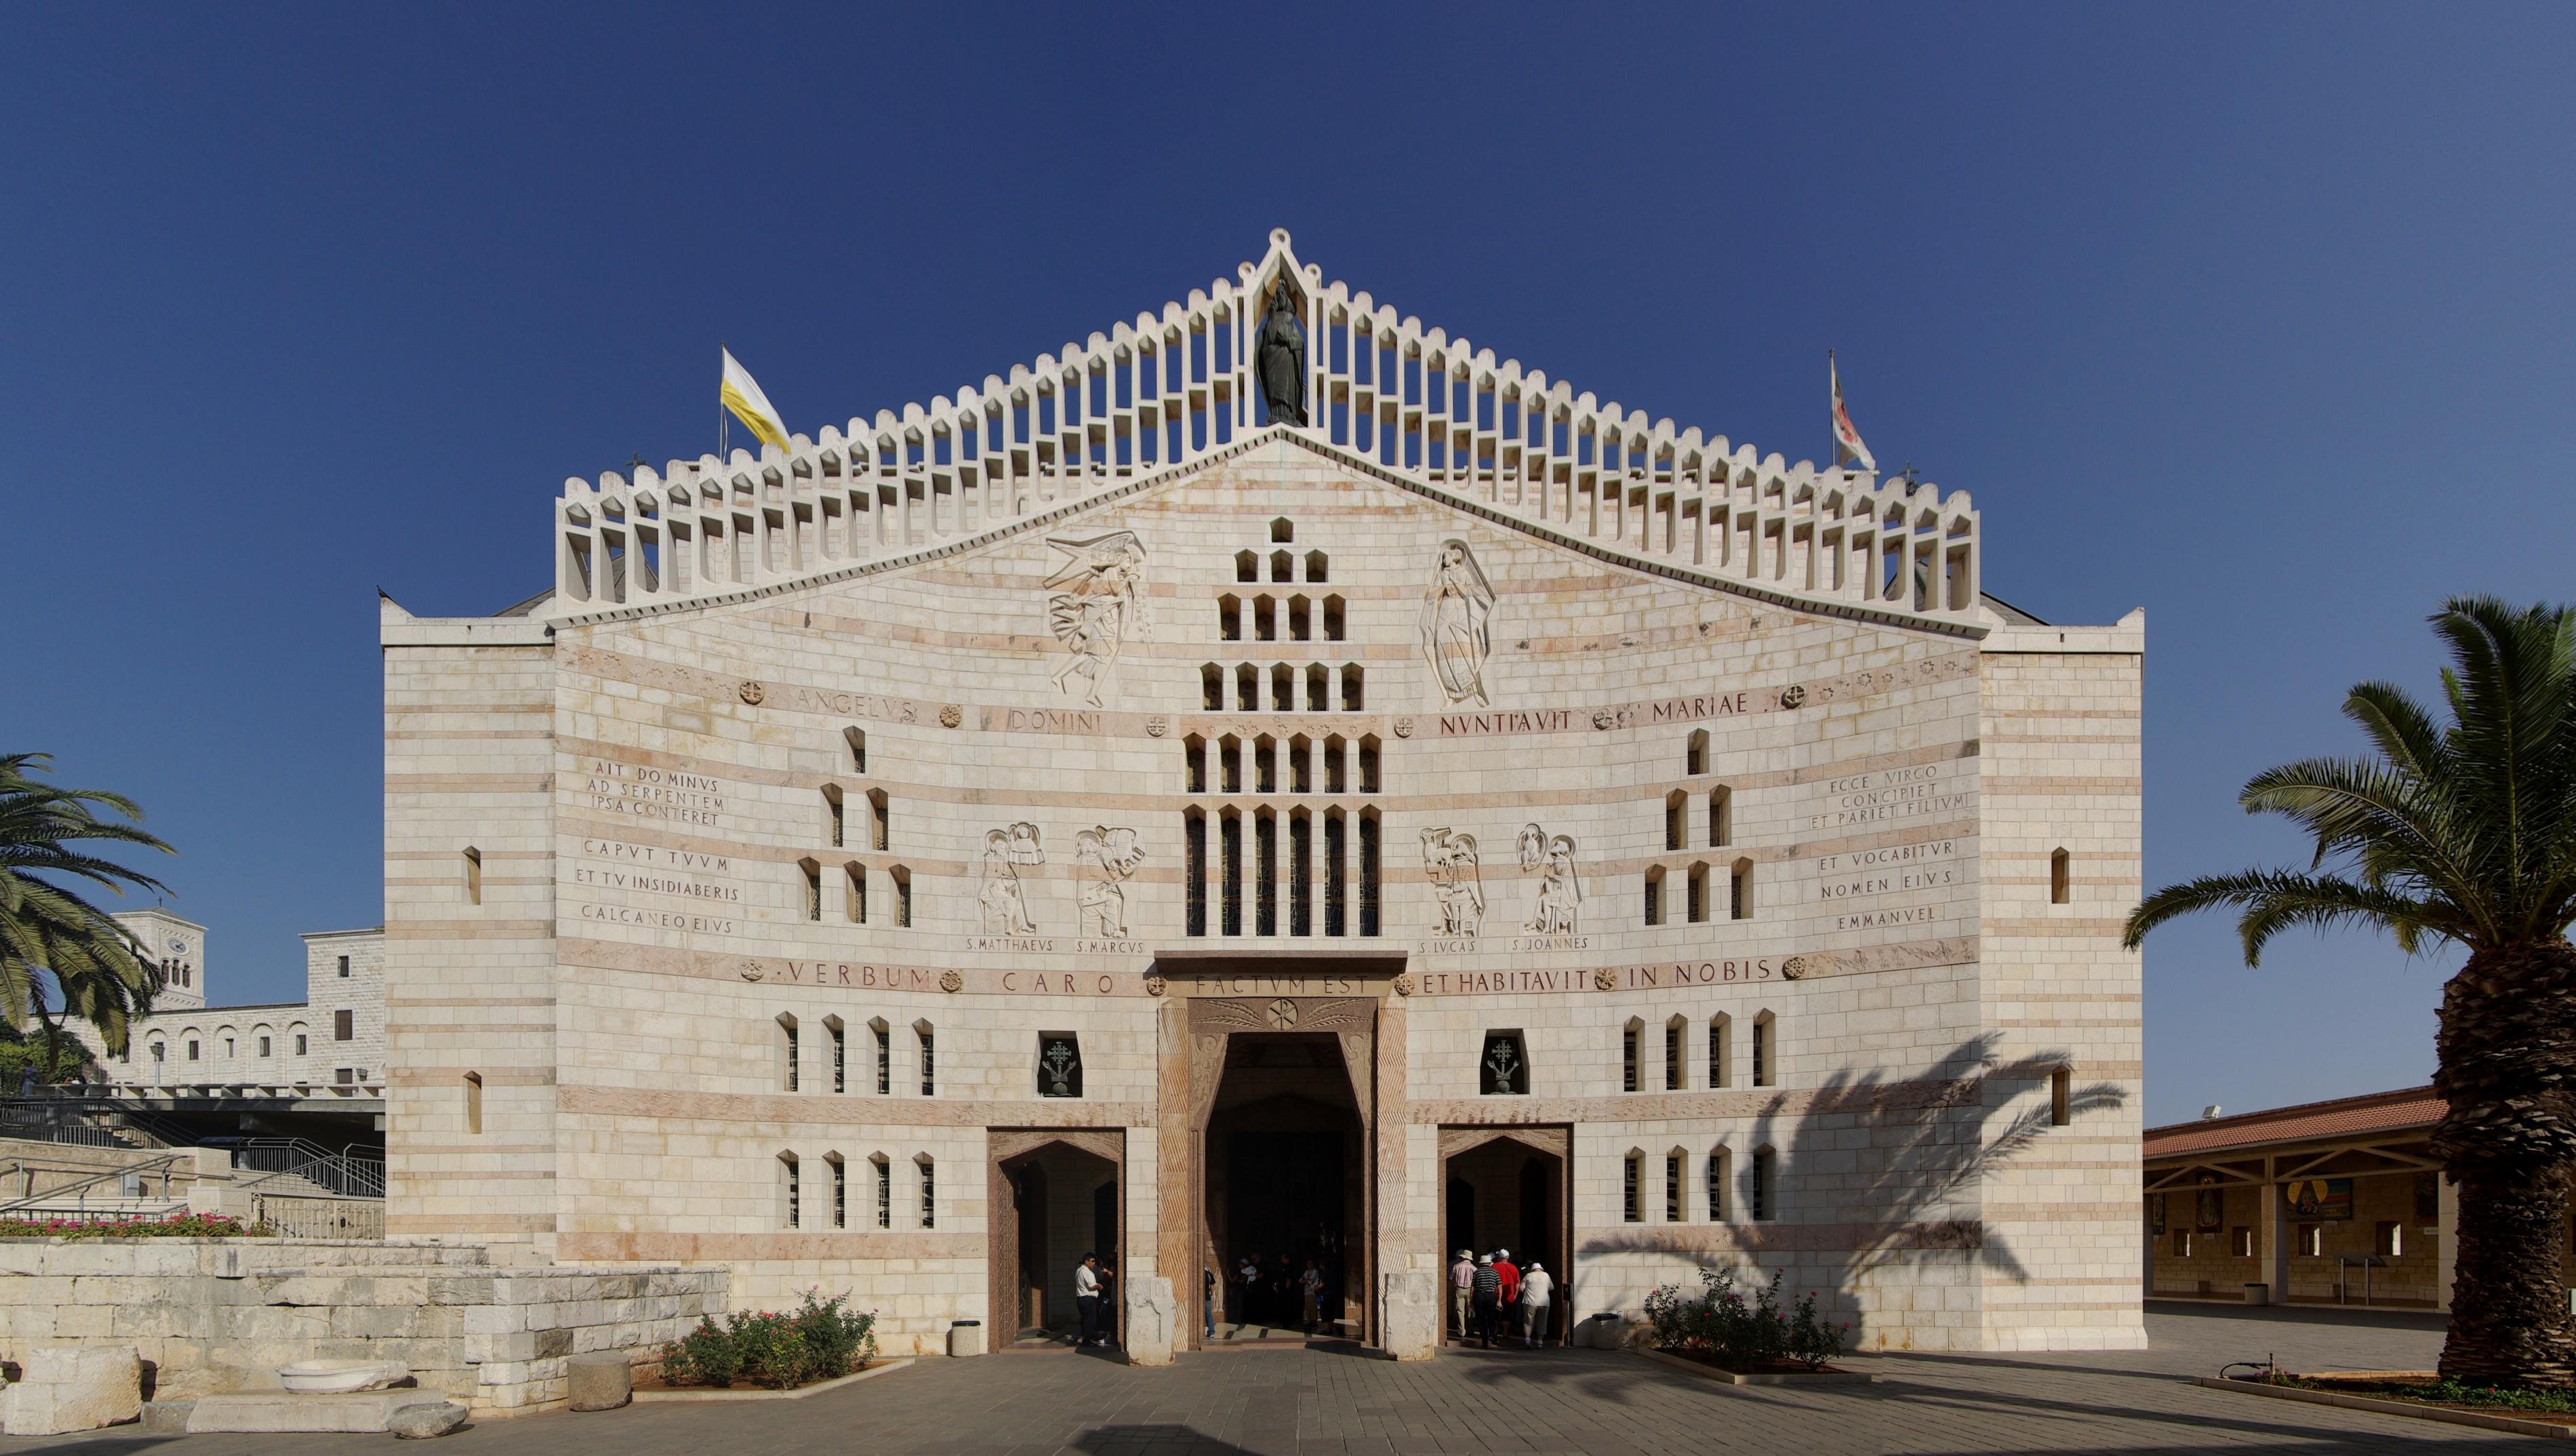 {{de|Nazaret, Verkündigungsbasilika}} {{en|Nazareth, Basilica of the Annunciation}}